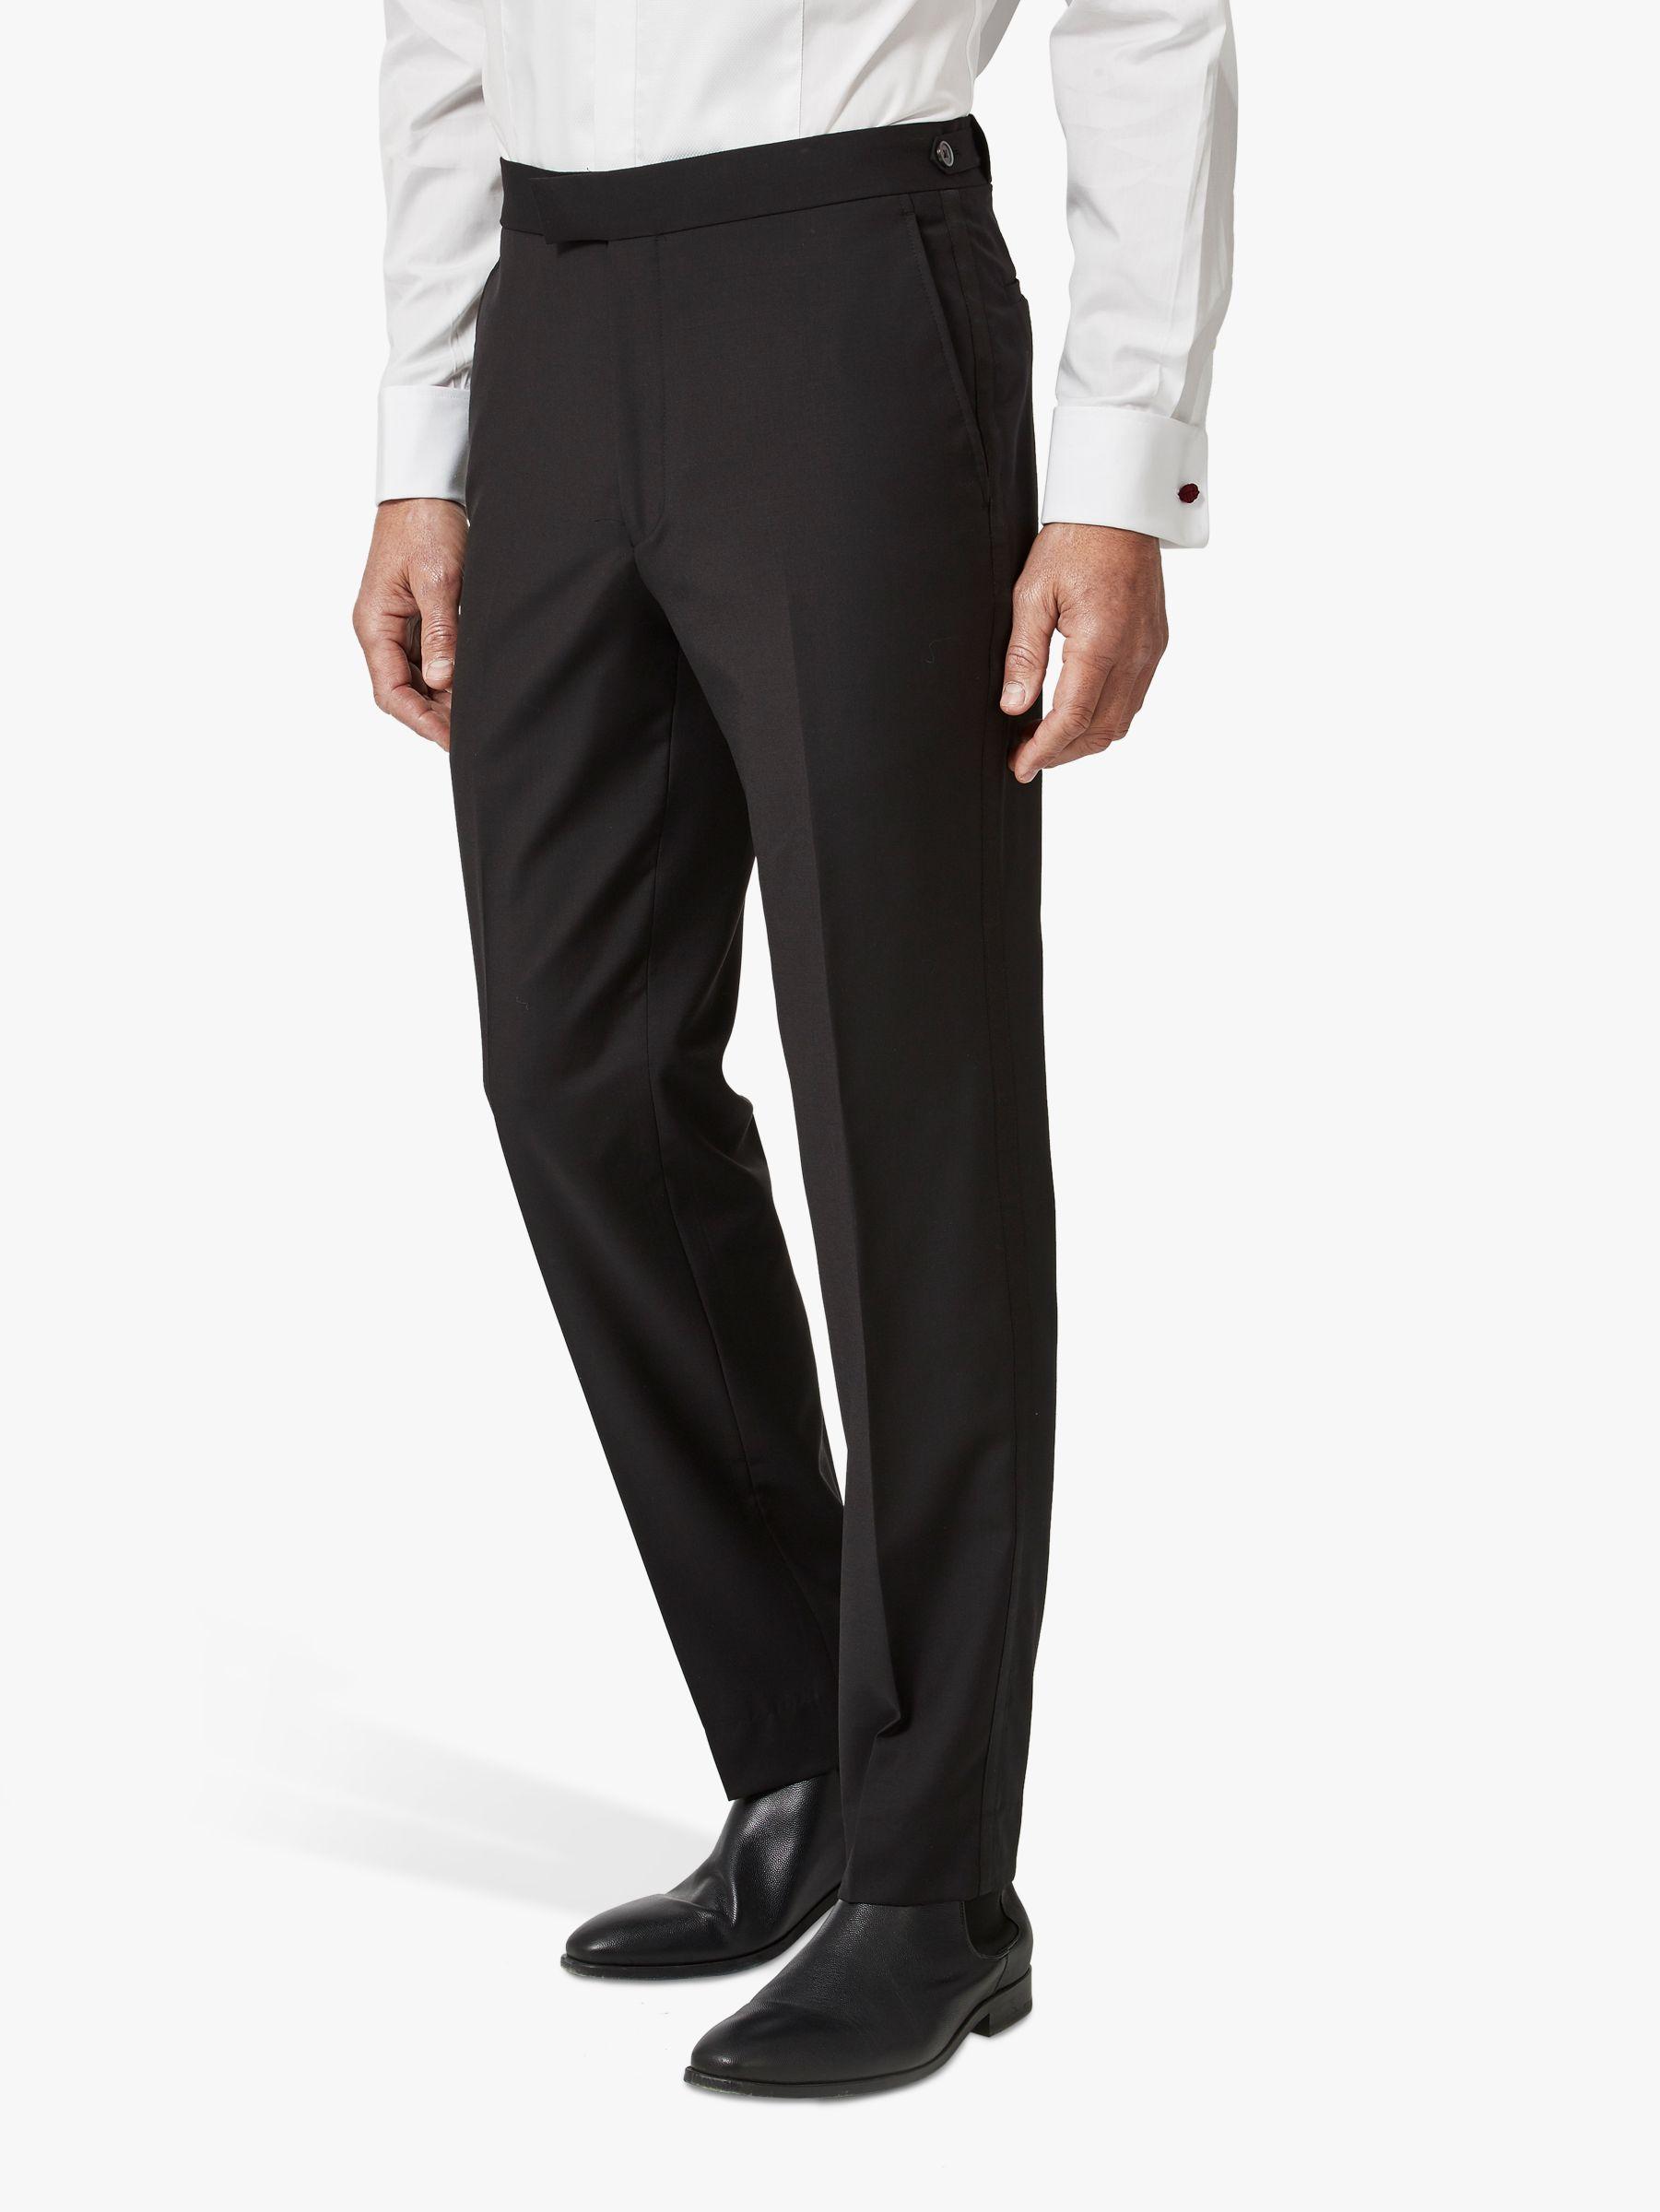 Chester by Chester Barrie Chester by Chester Barrie Wool Mohair Slim Fit Dress Suit Trousers, Black